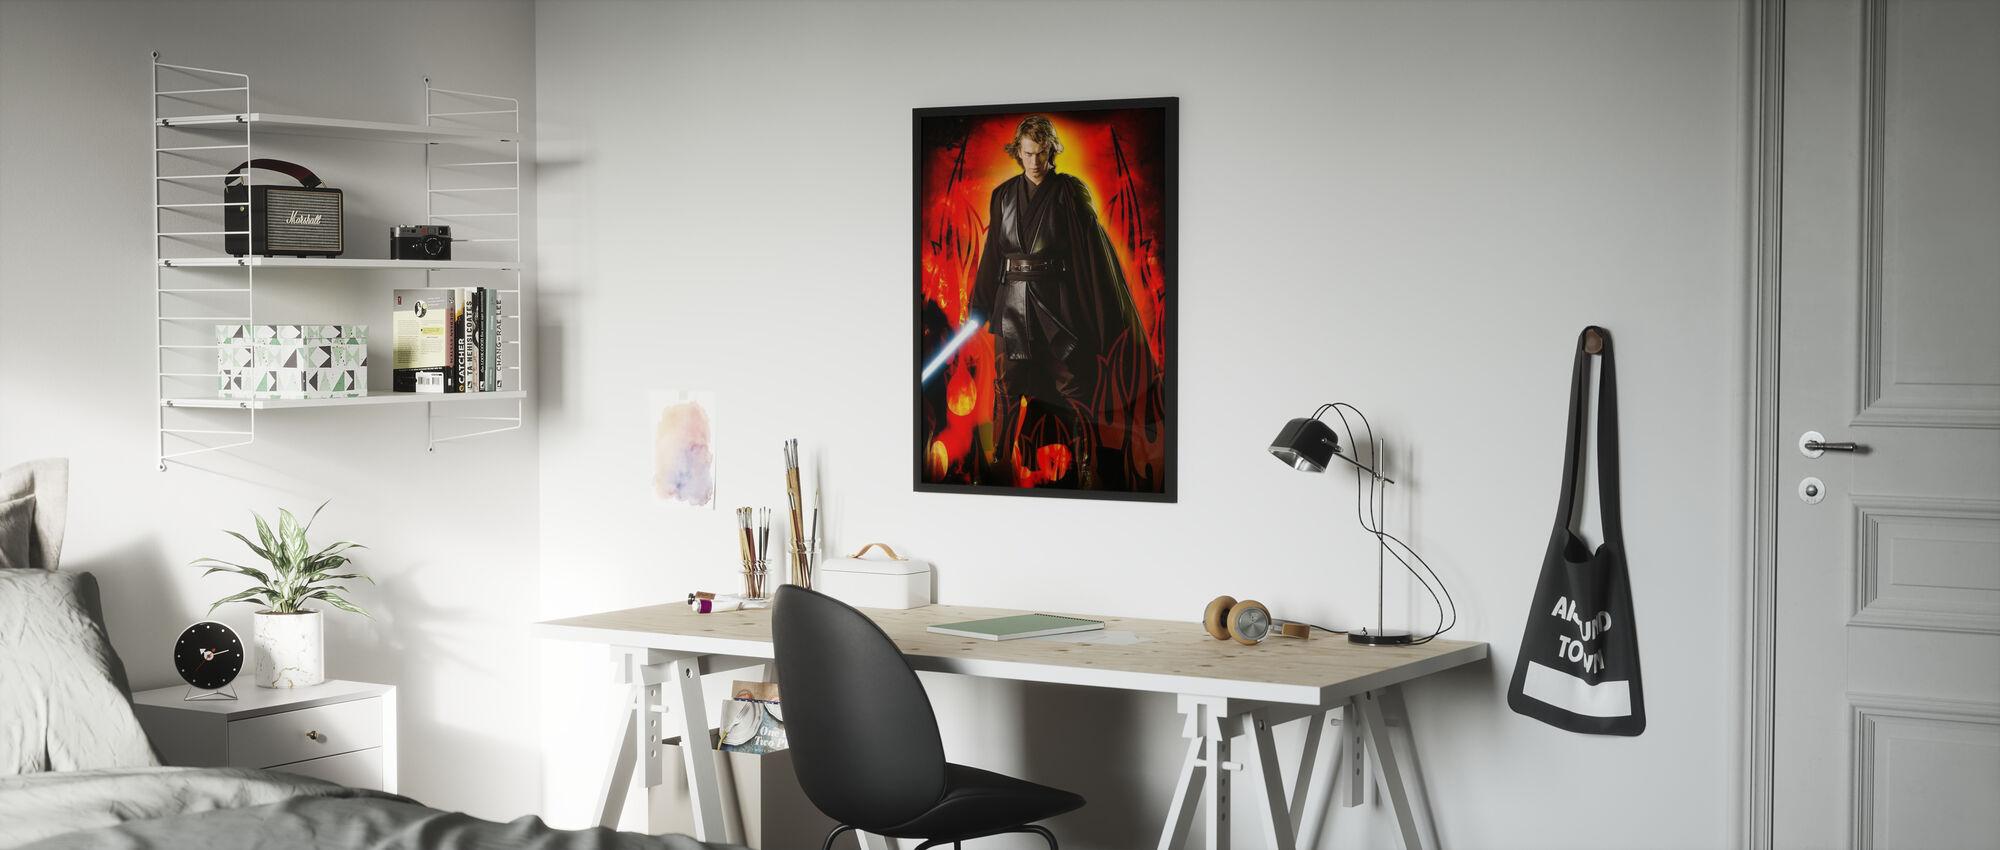 Star Wars - Anakin Skywalker Flames - Kehystetty kuva - Lastenhuone